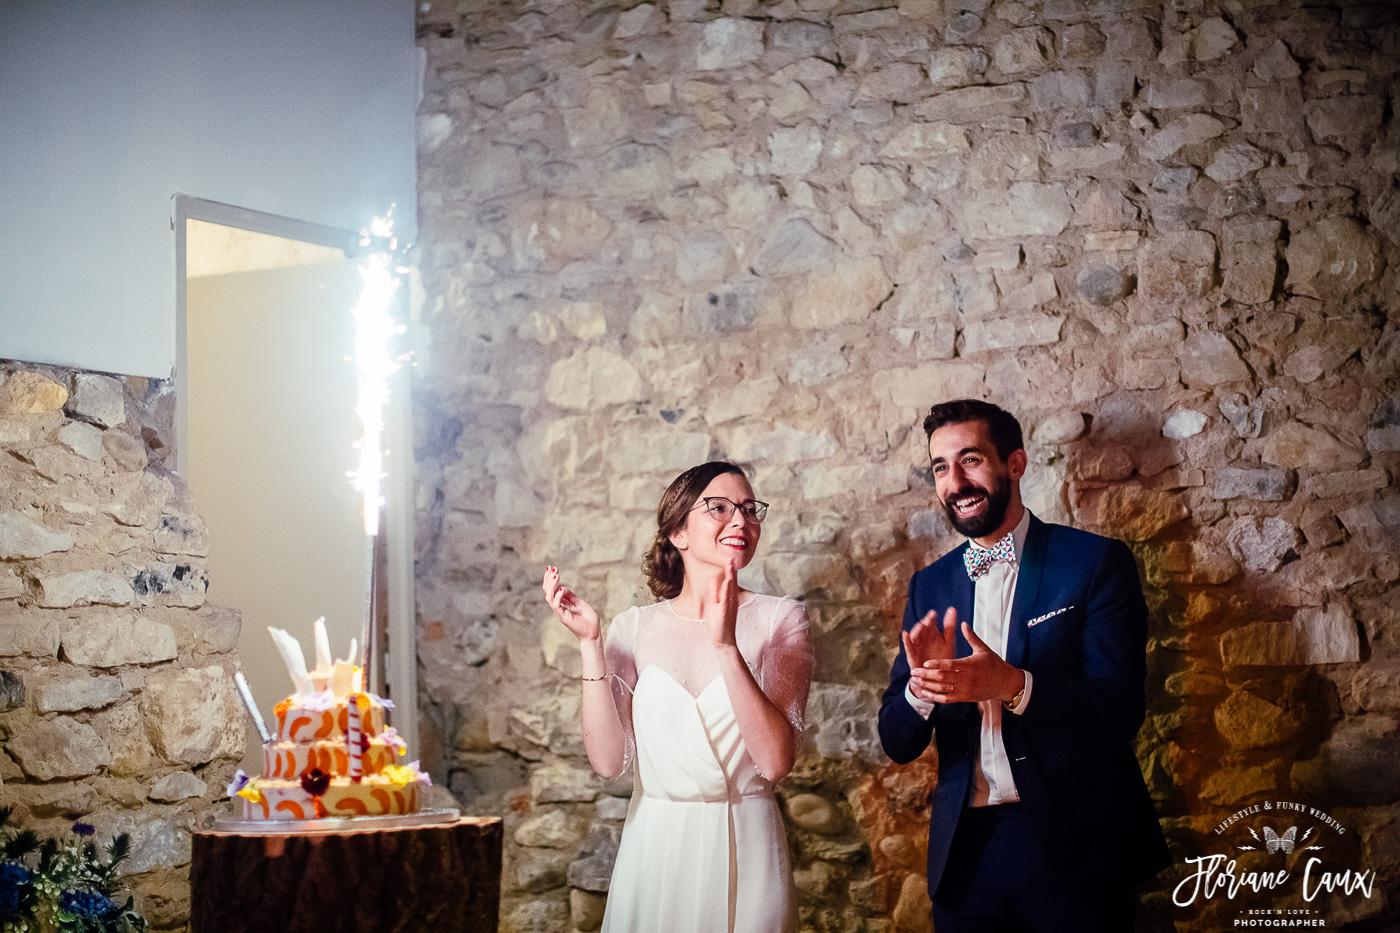 photographe-mariage-pays-basque-Floriane-Caux (100)